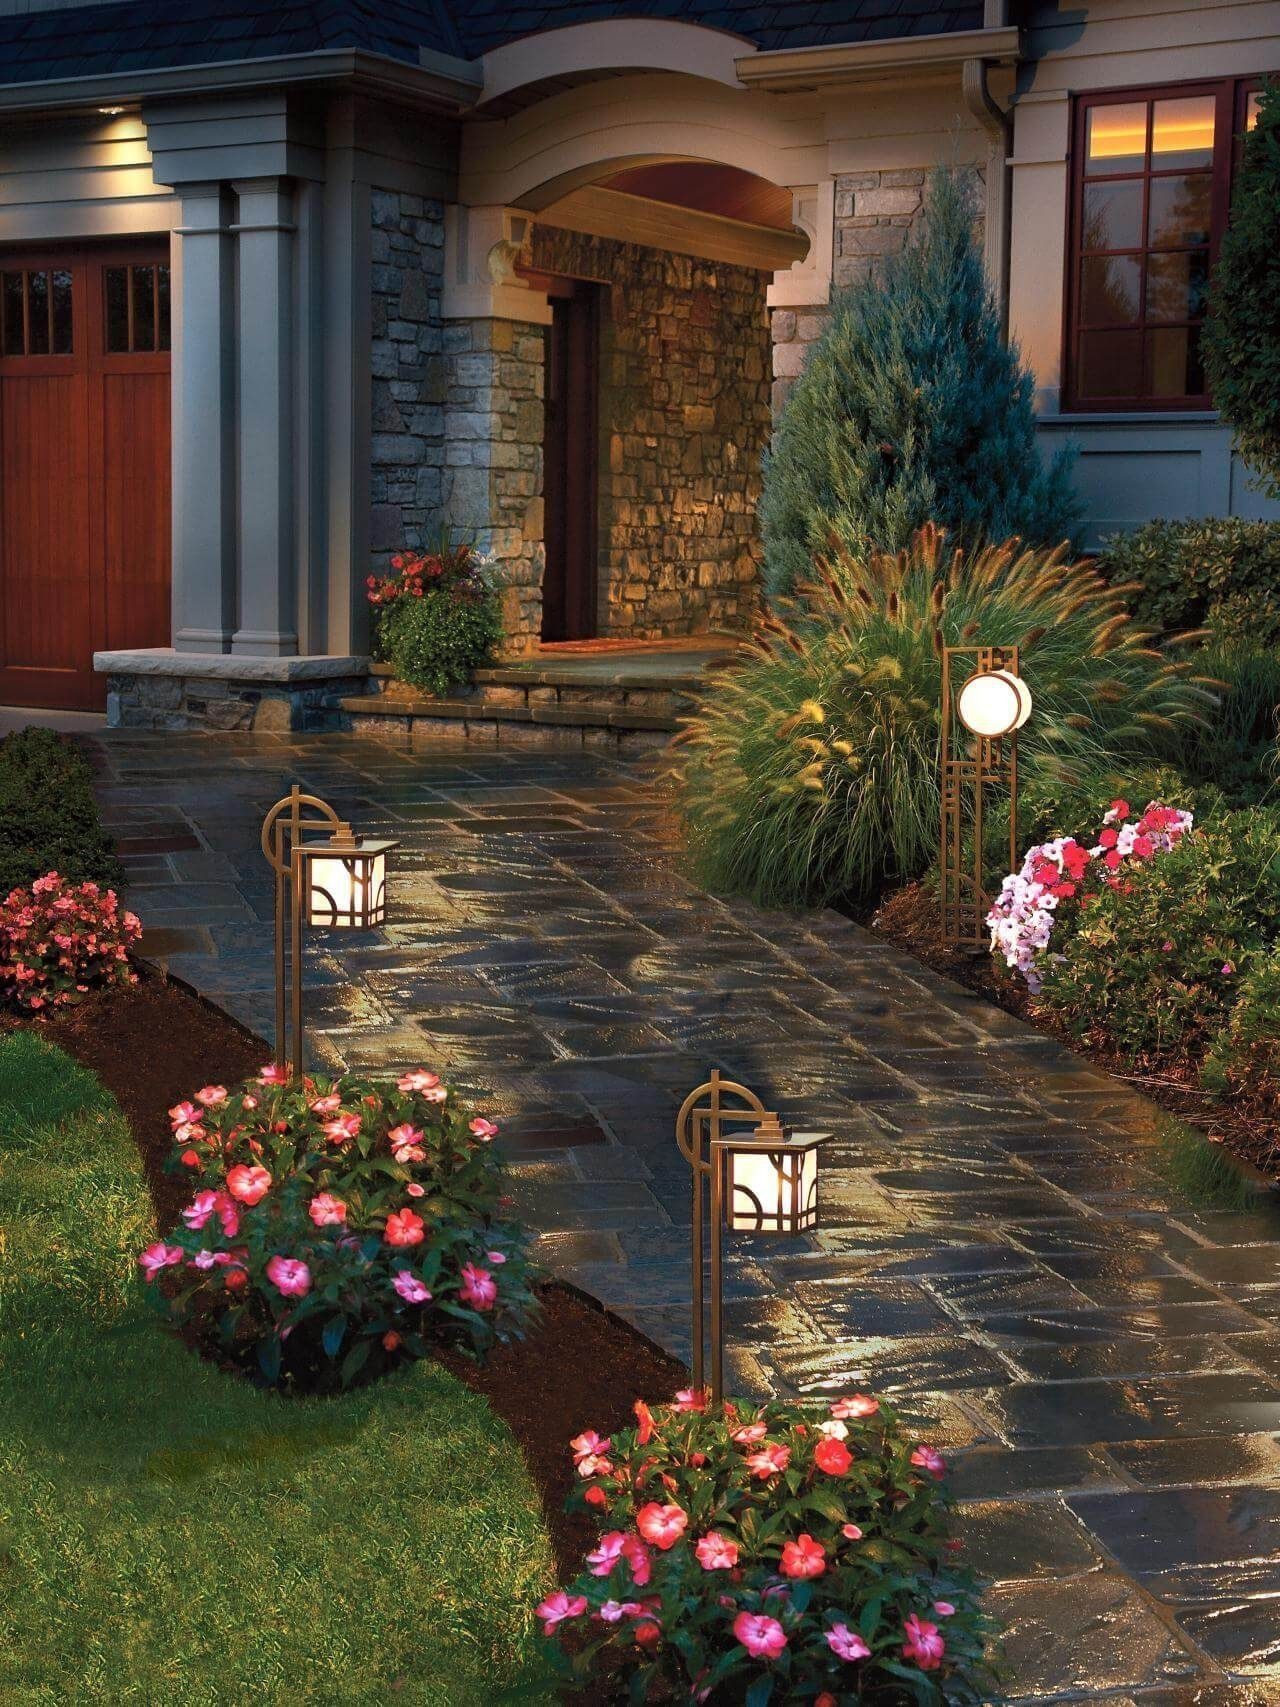 10 Modern Frontyard Gardening Ideas To Inspire - decorhit.com